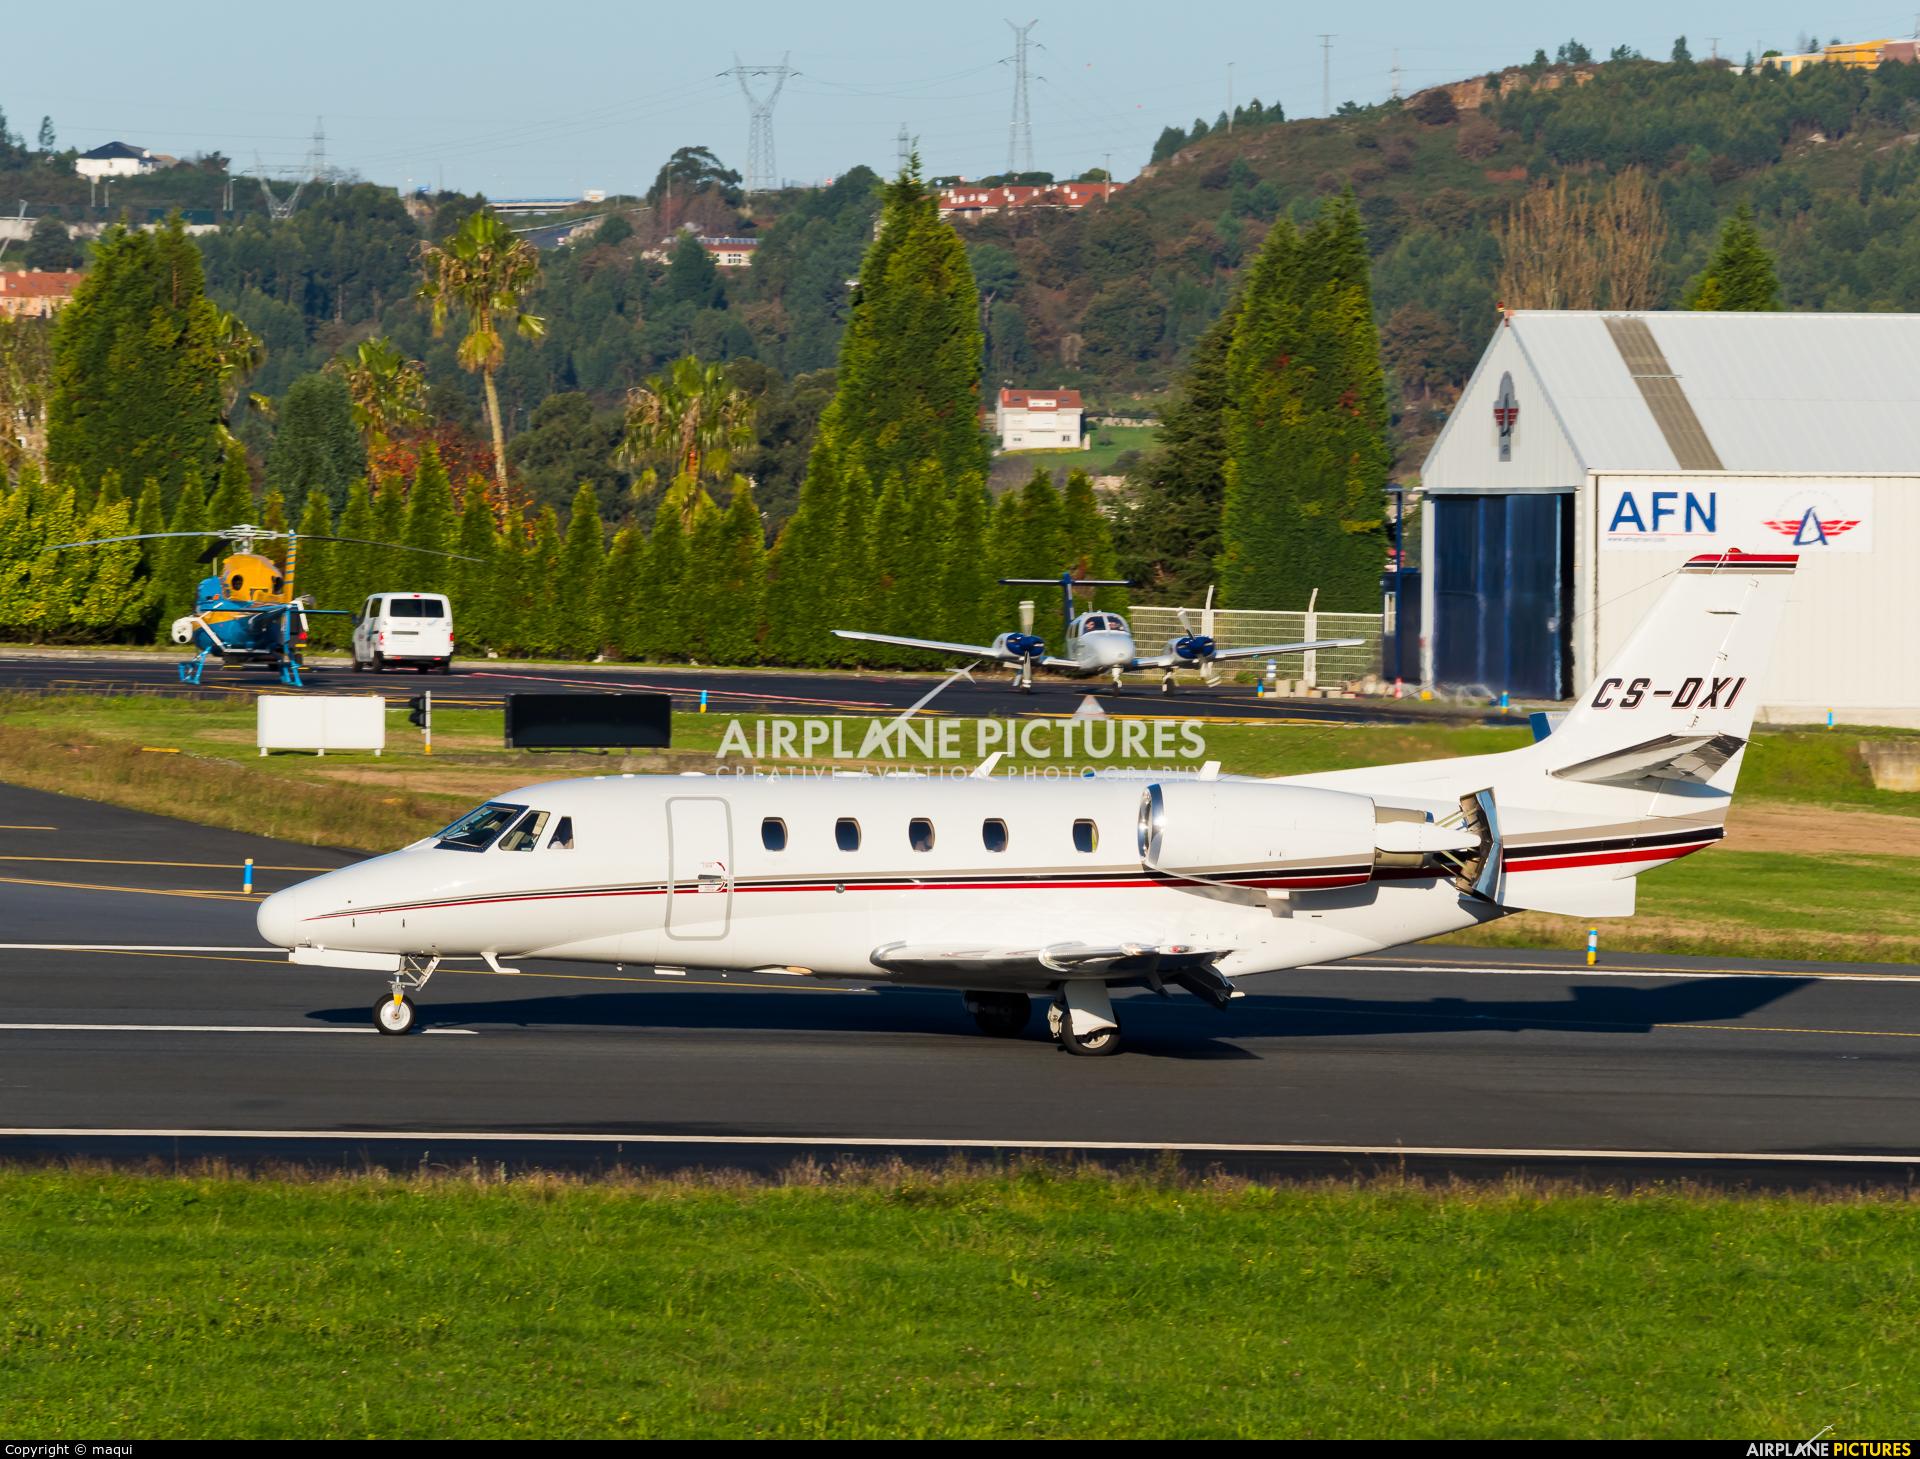 NetJets Europe (Portugal) CS-DXI aircraft at La Coruña